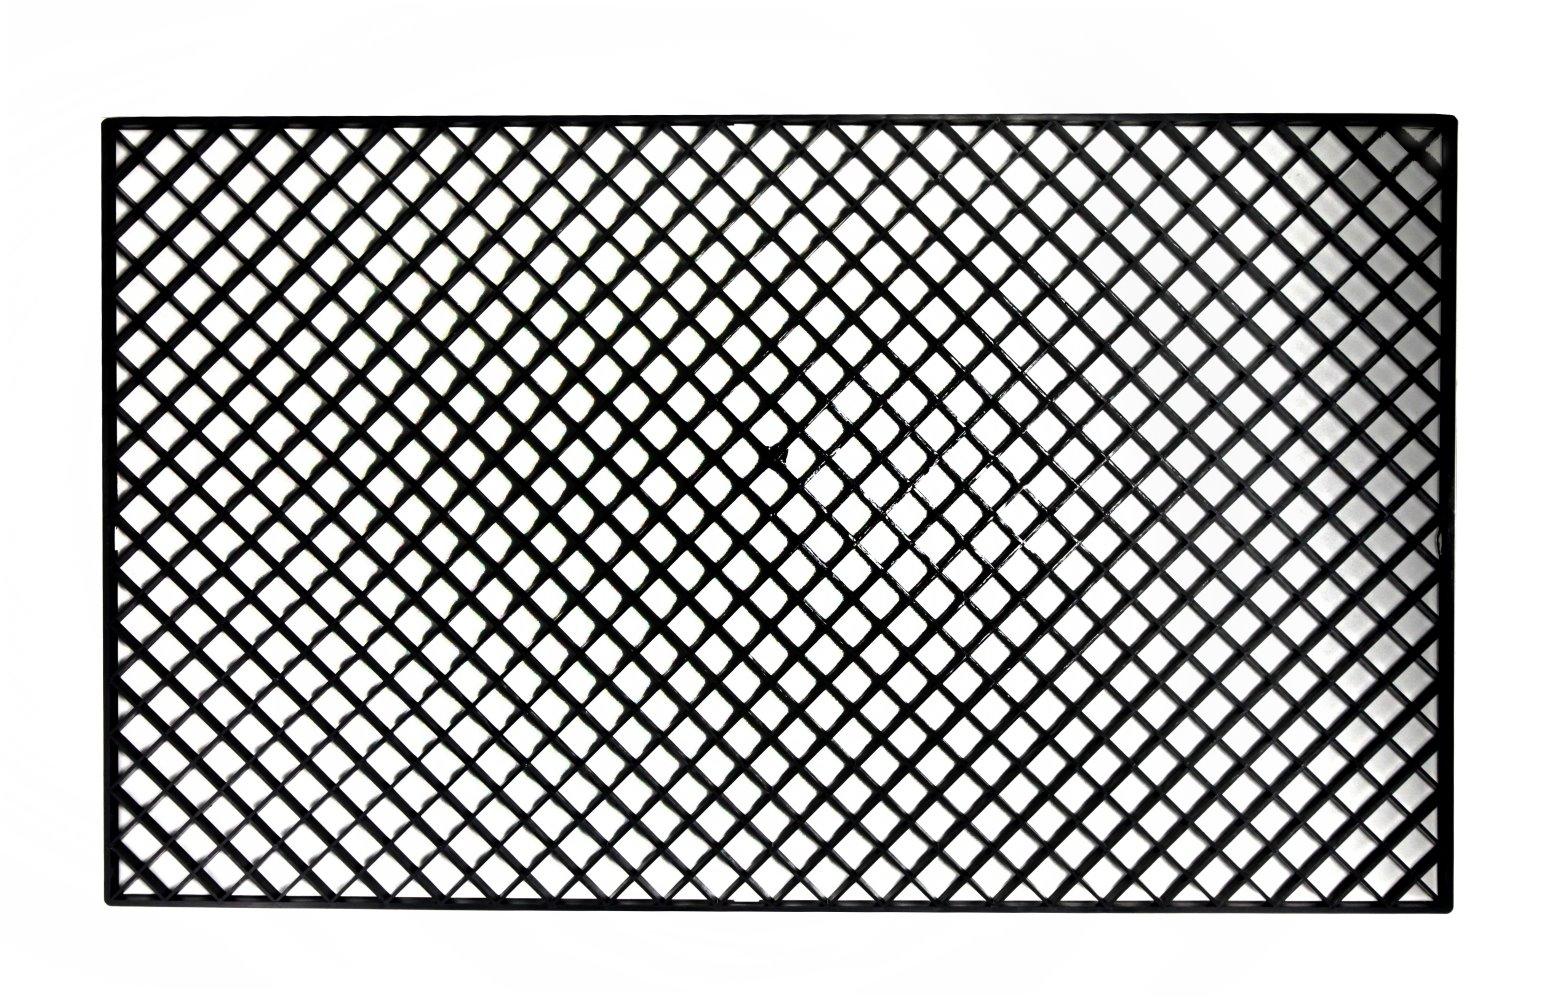 Filtermedienauflage 68x40 cm